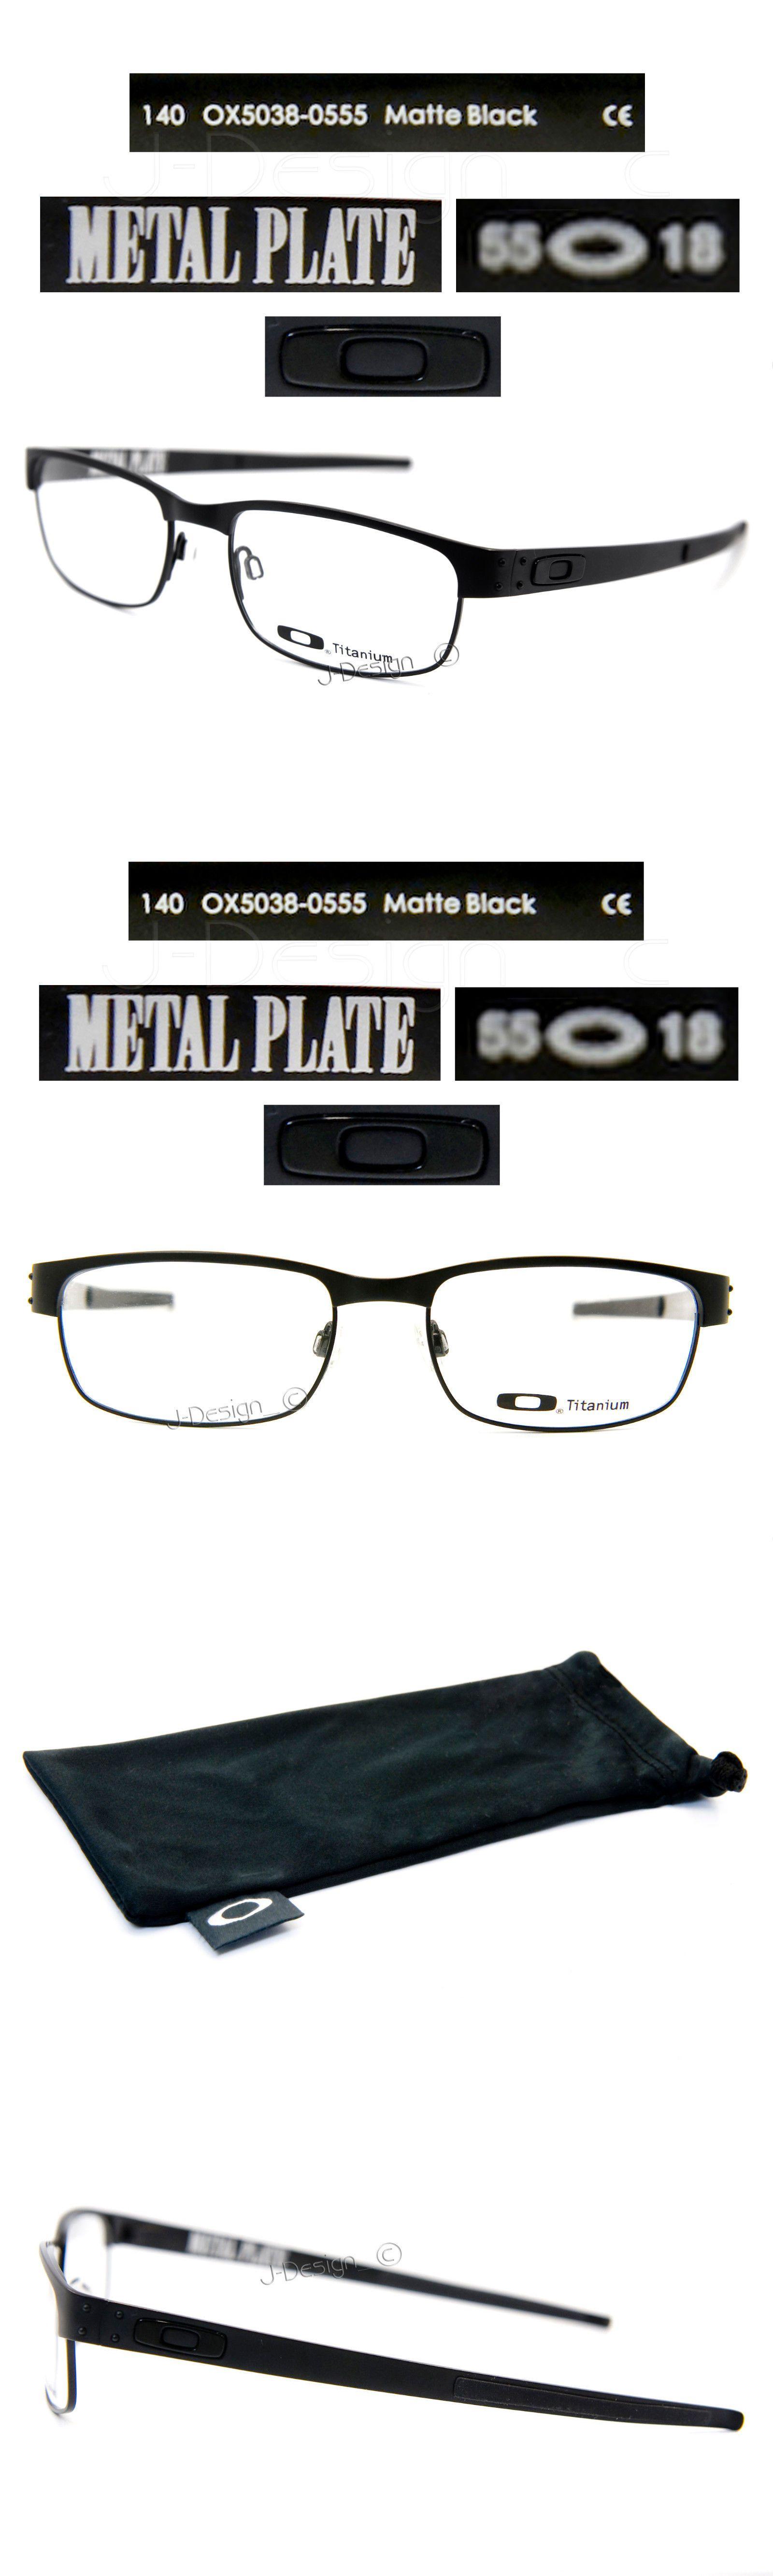 b03c6f947a9 Eyeglass Frames 180957  Oakley Metal Plate Ox5038-0555 Matte Black Titanium  Eyeglasses 55 18